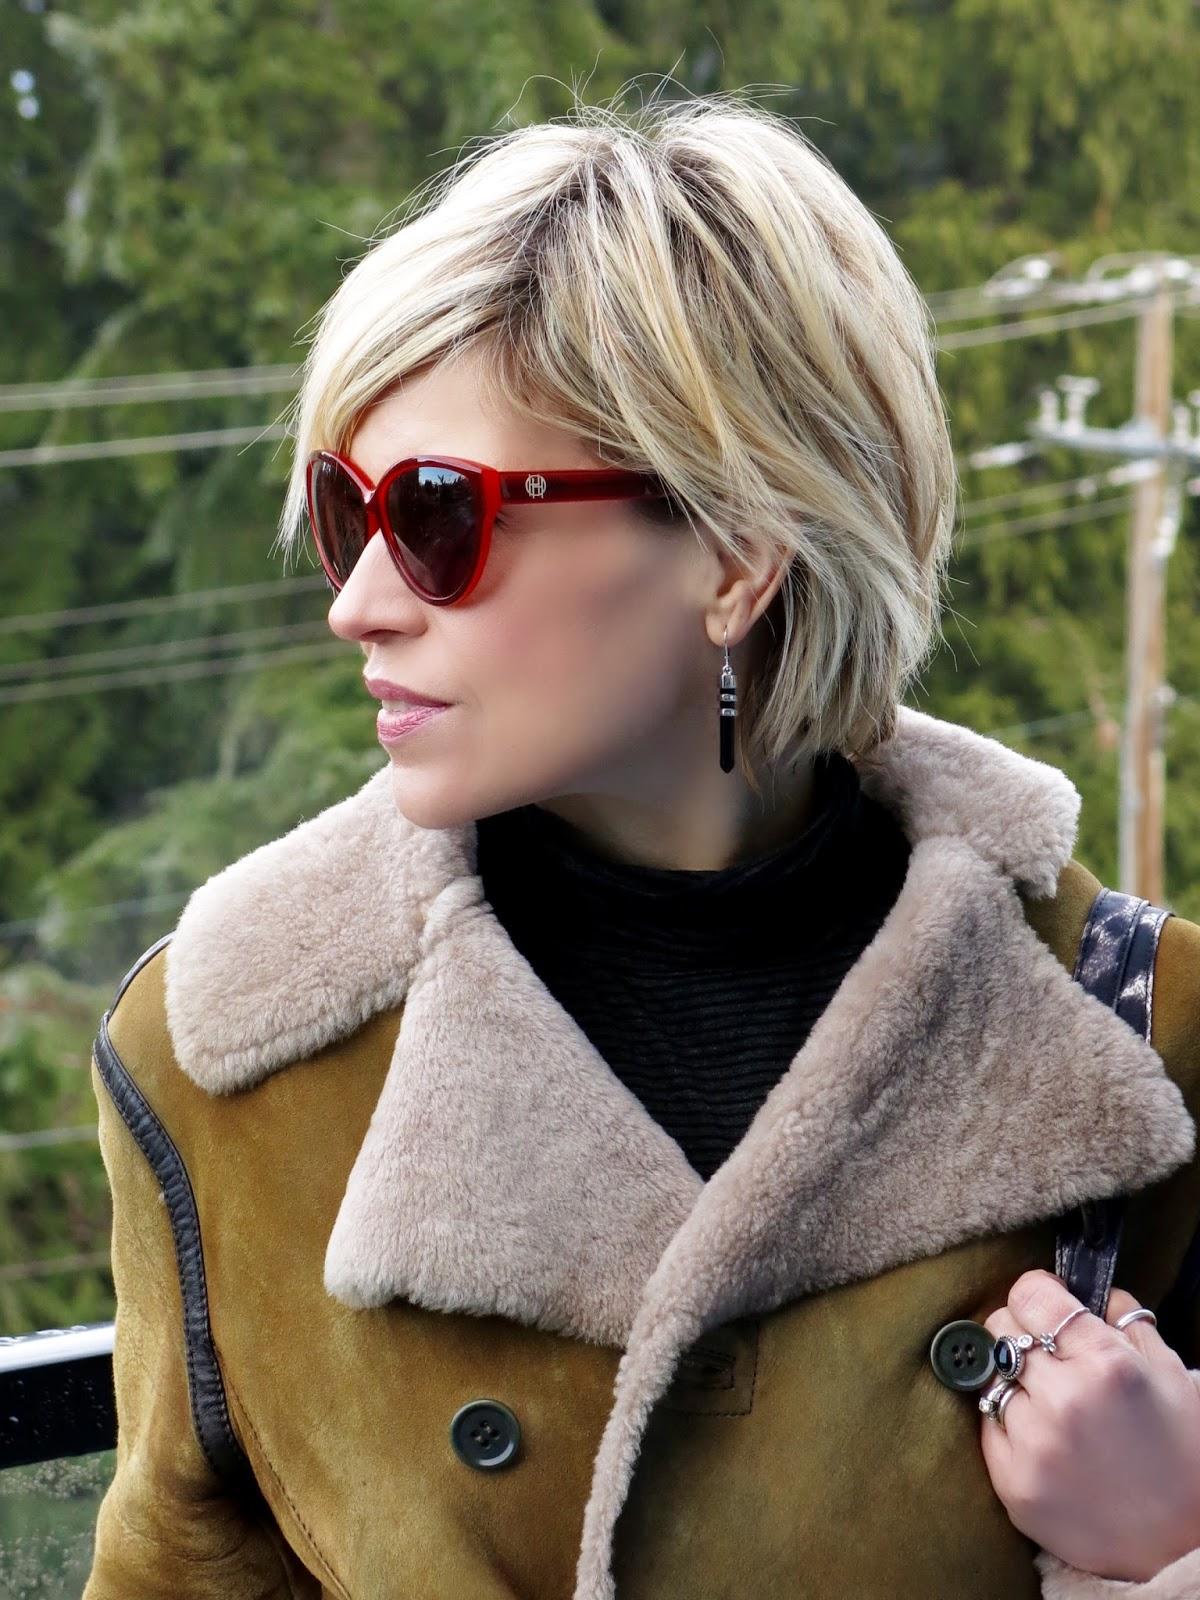 Diesel sheepskin coat, House of Harlow 1960 sunglasses